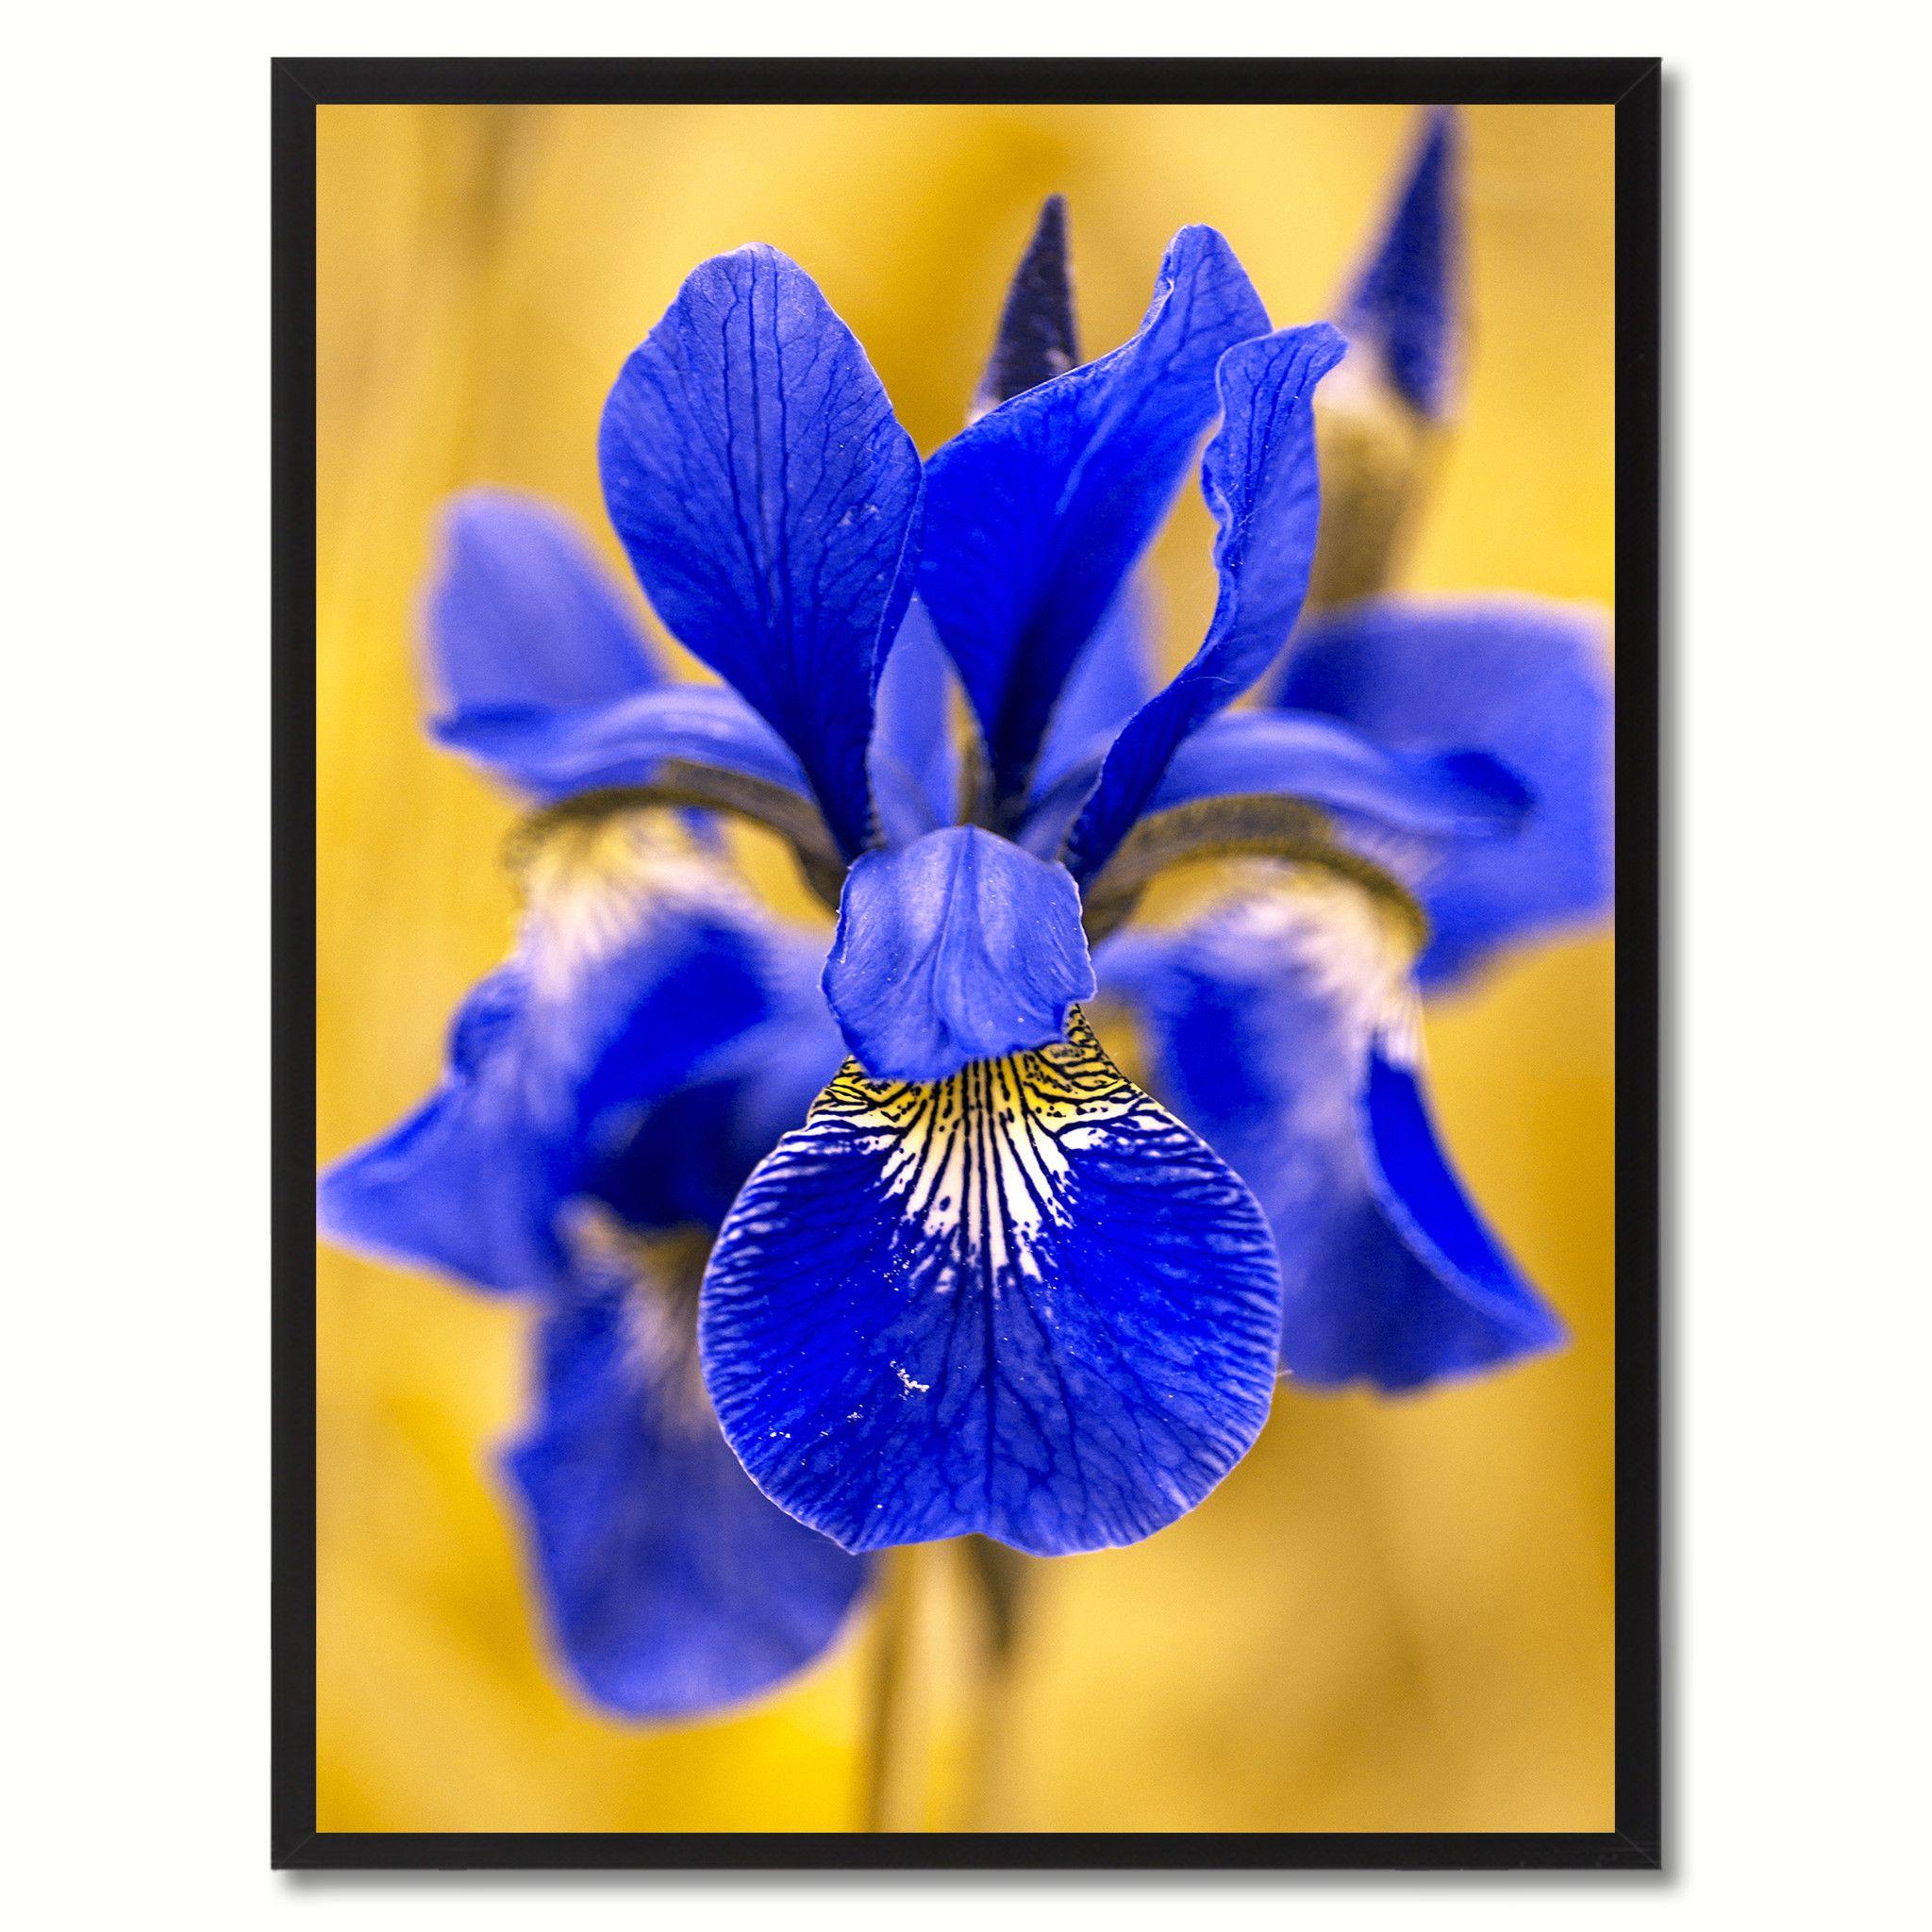 Blue Iris Flower Framed Canvas Print Home Dcor Wall Art Framed